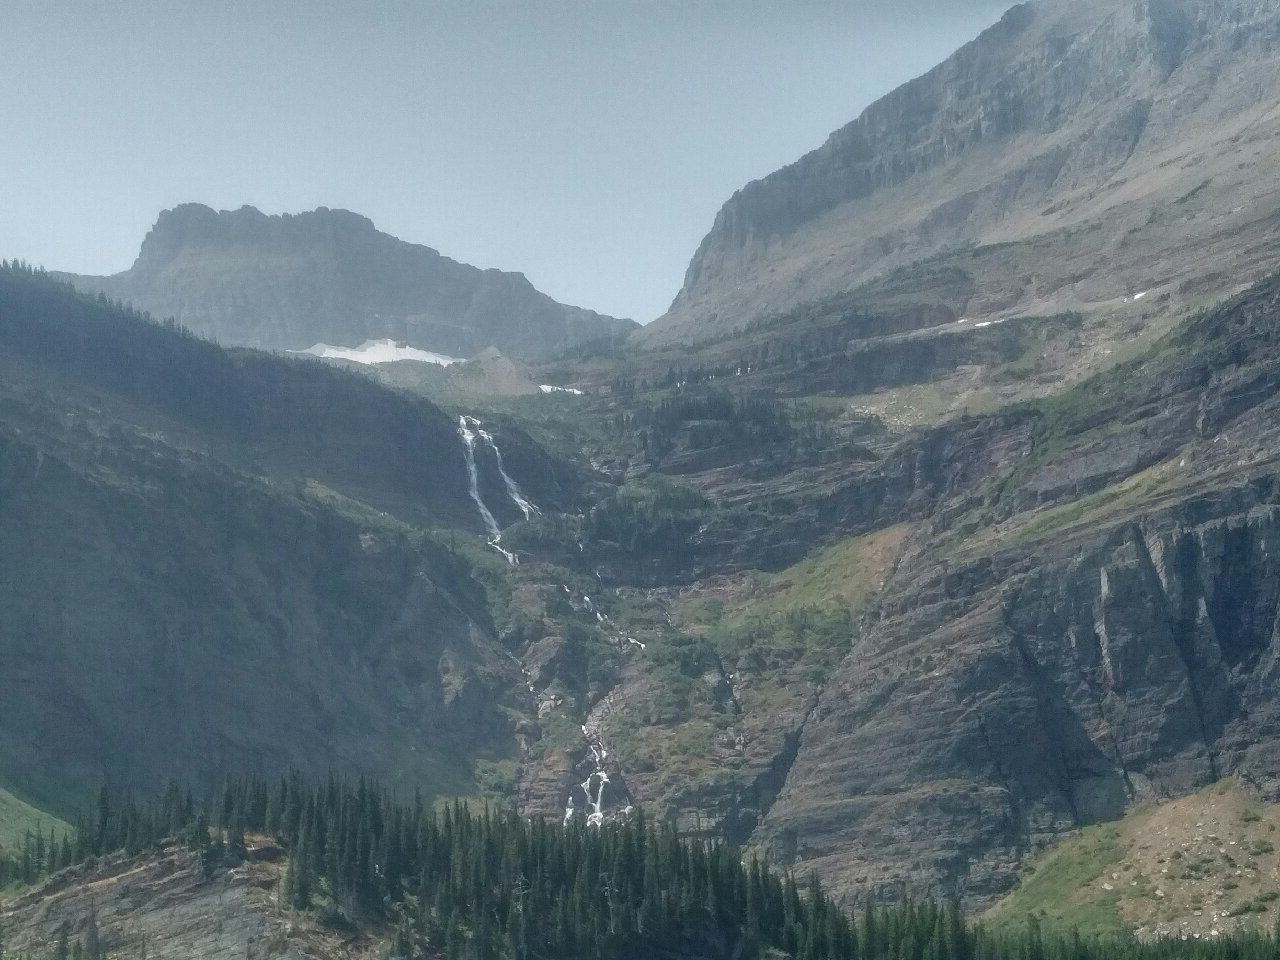 Glacier-National-Park-Avid-Amiri-10